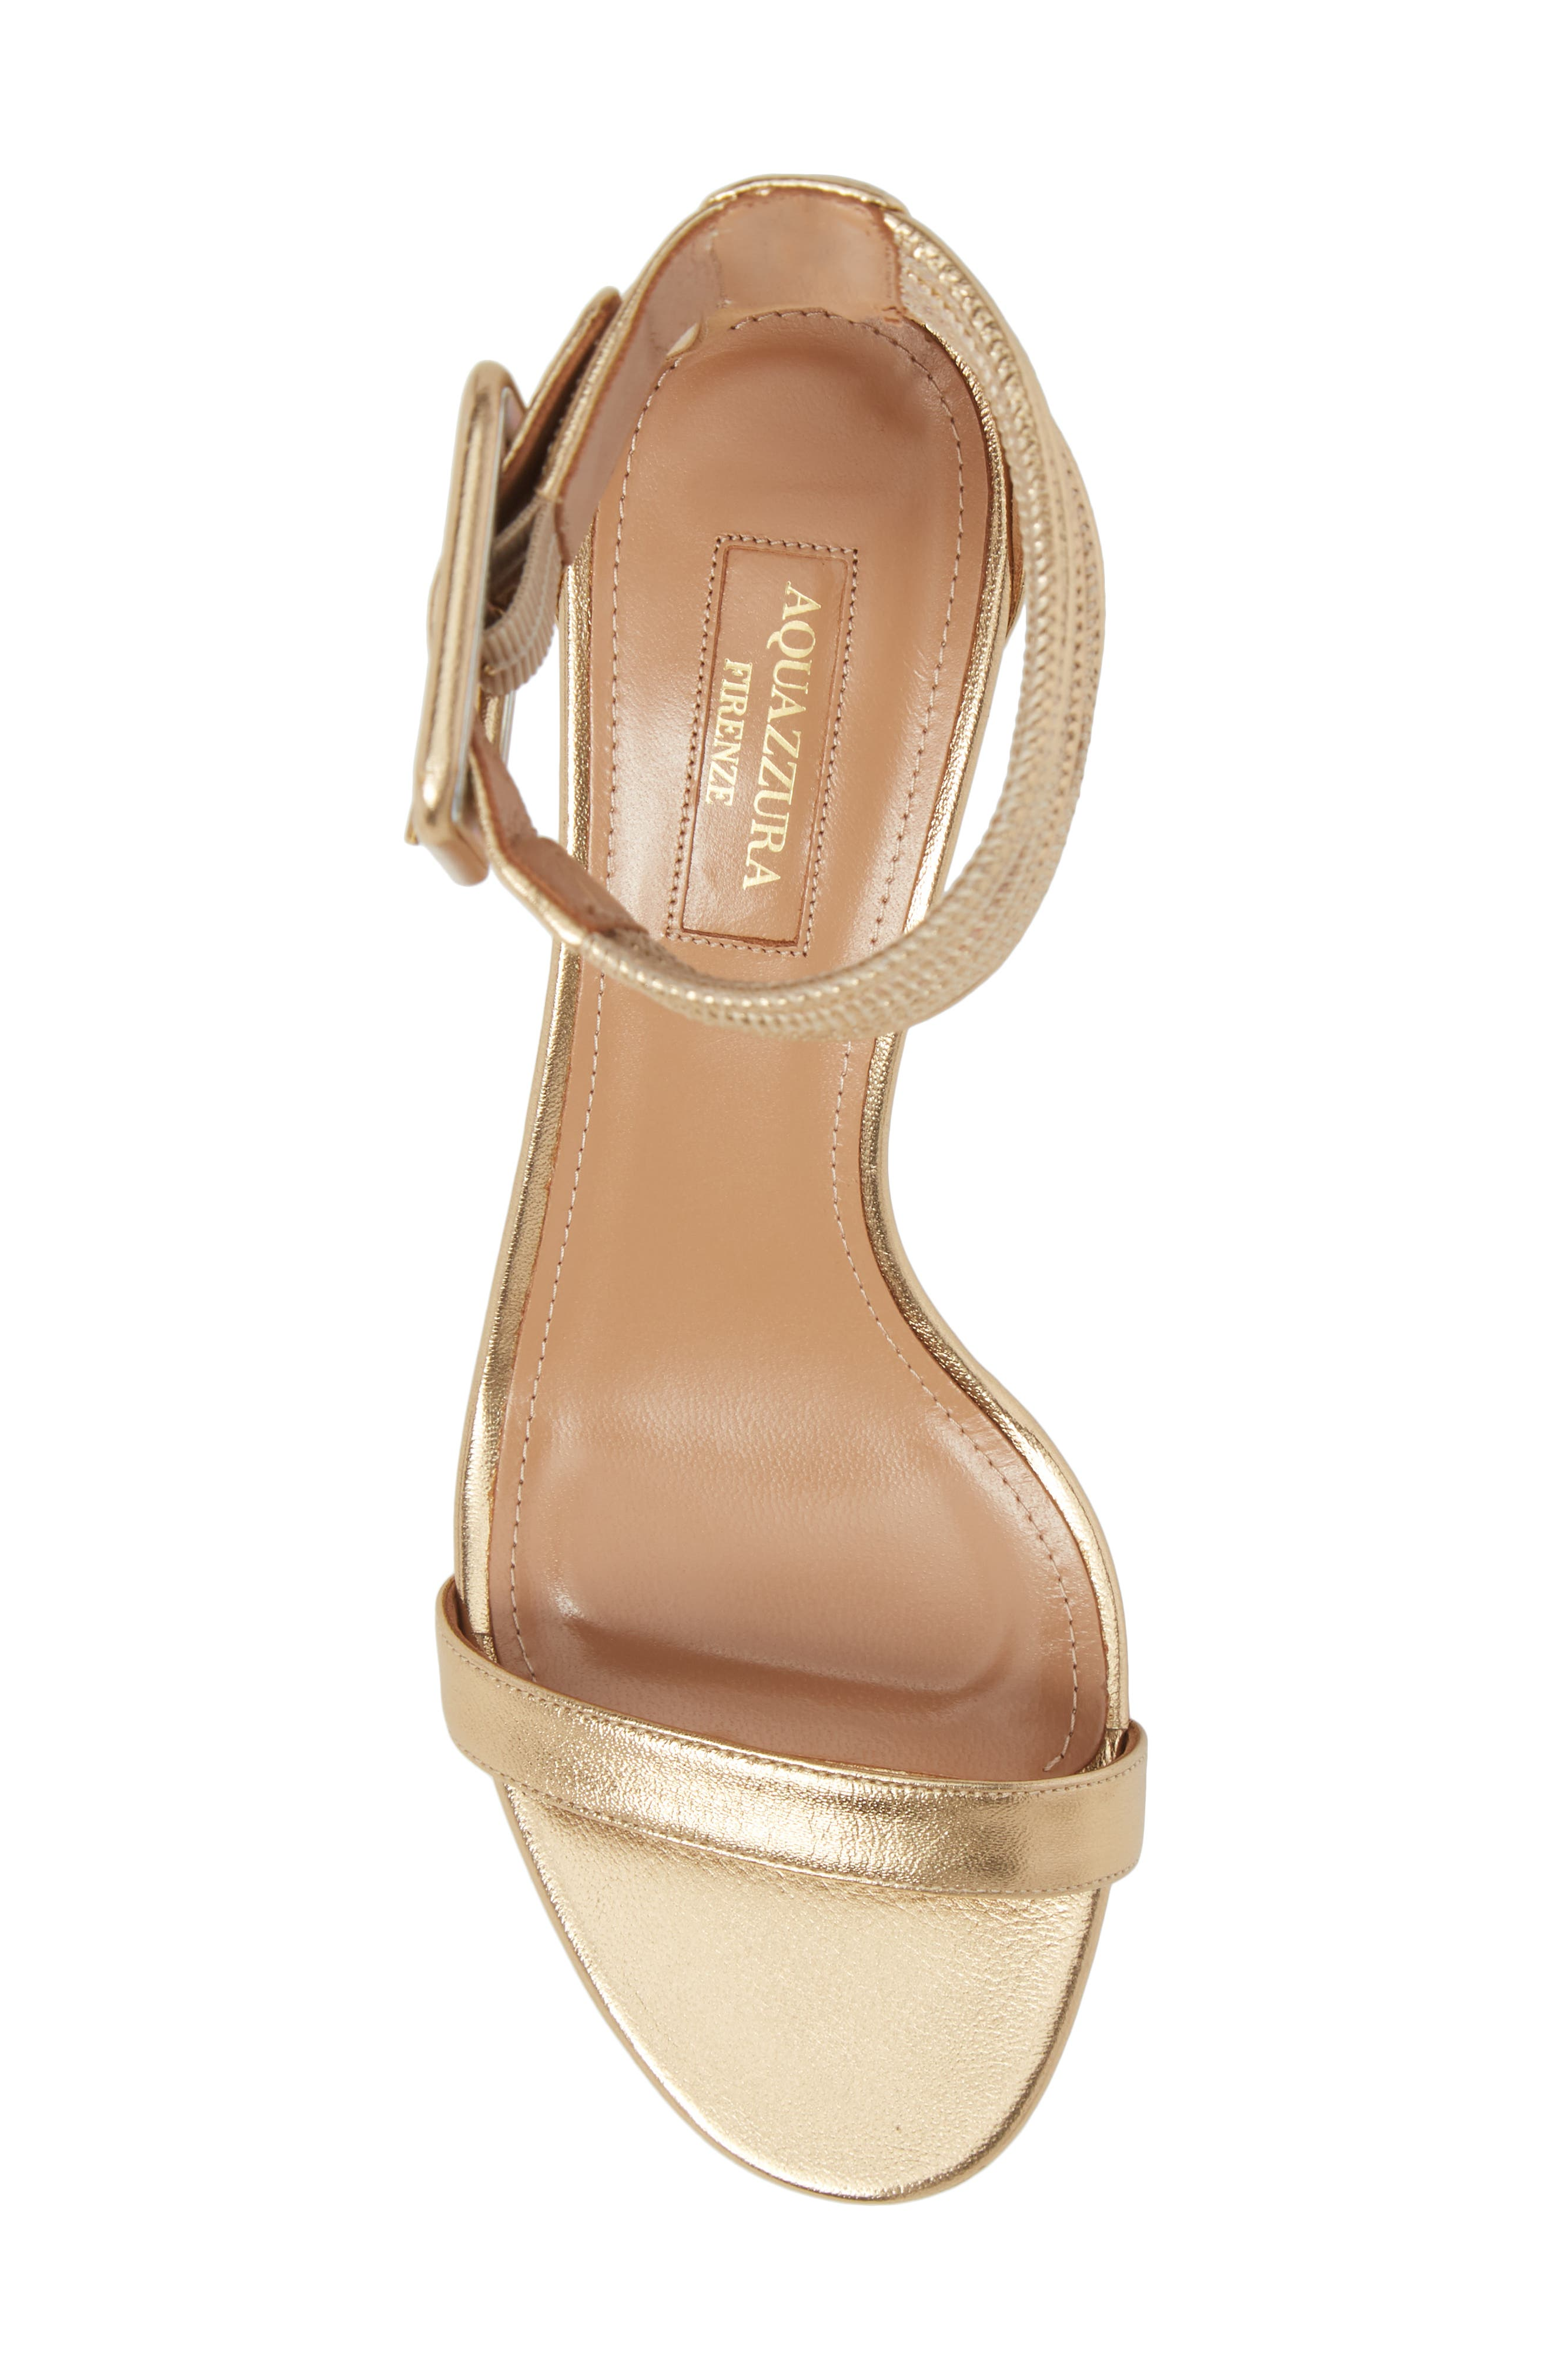 Casablanca Ankle Cuff Sandal,                             Alternate thumbnail 5, color,                             SOFT GOLD